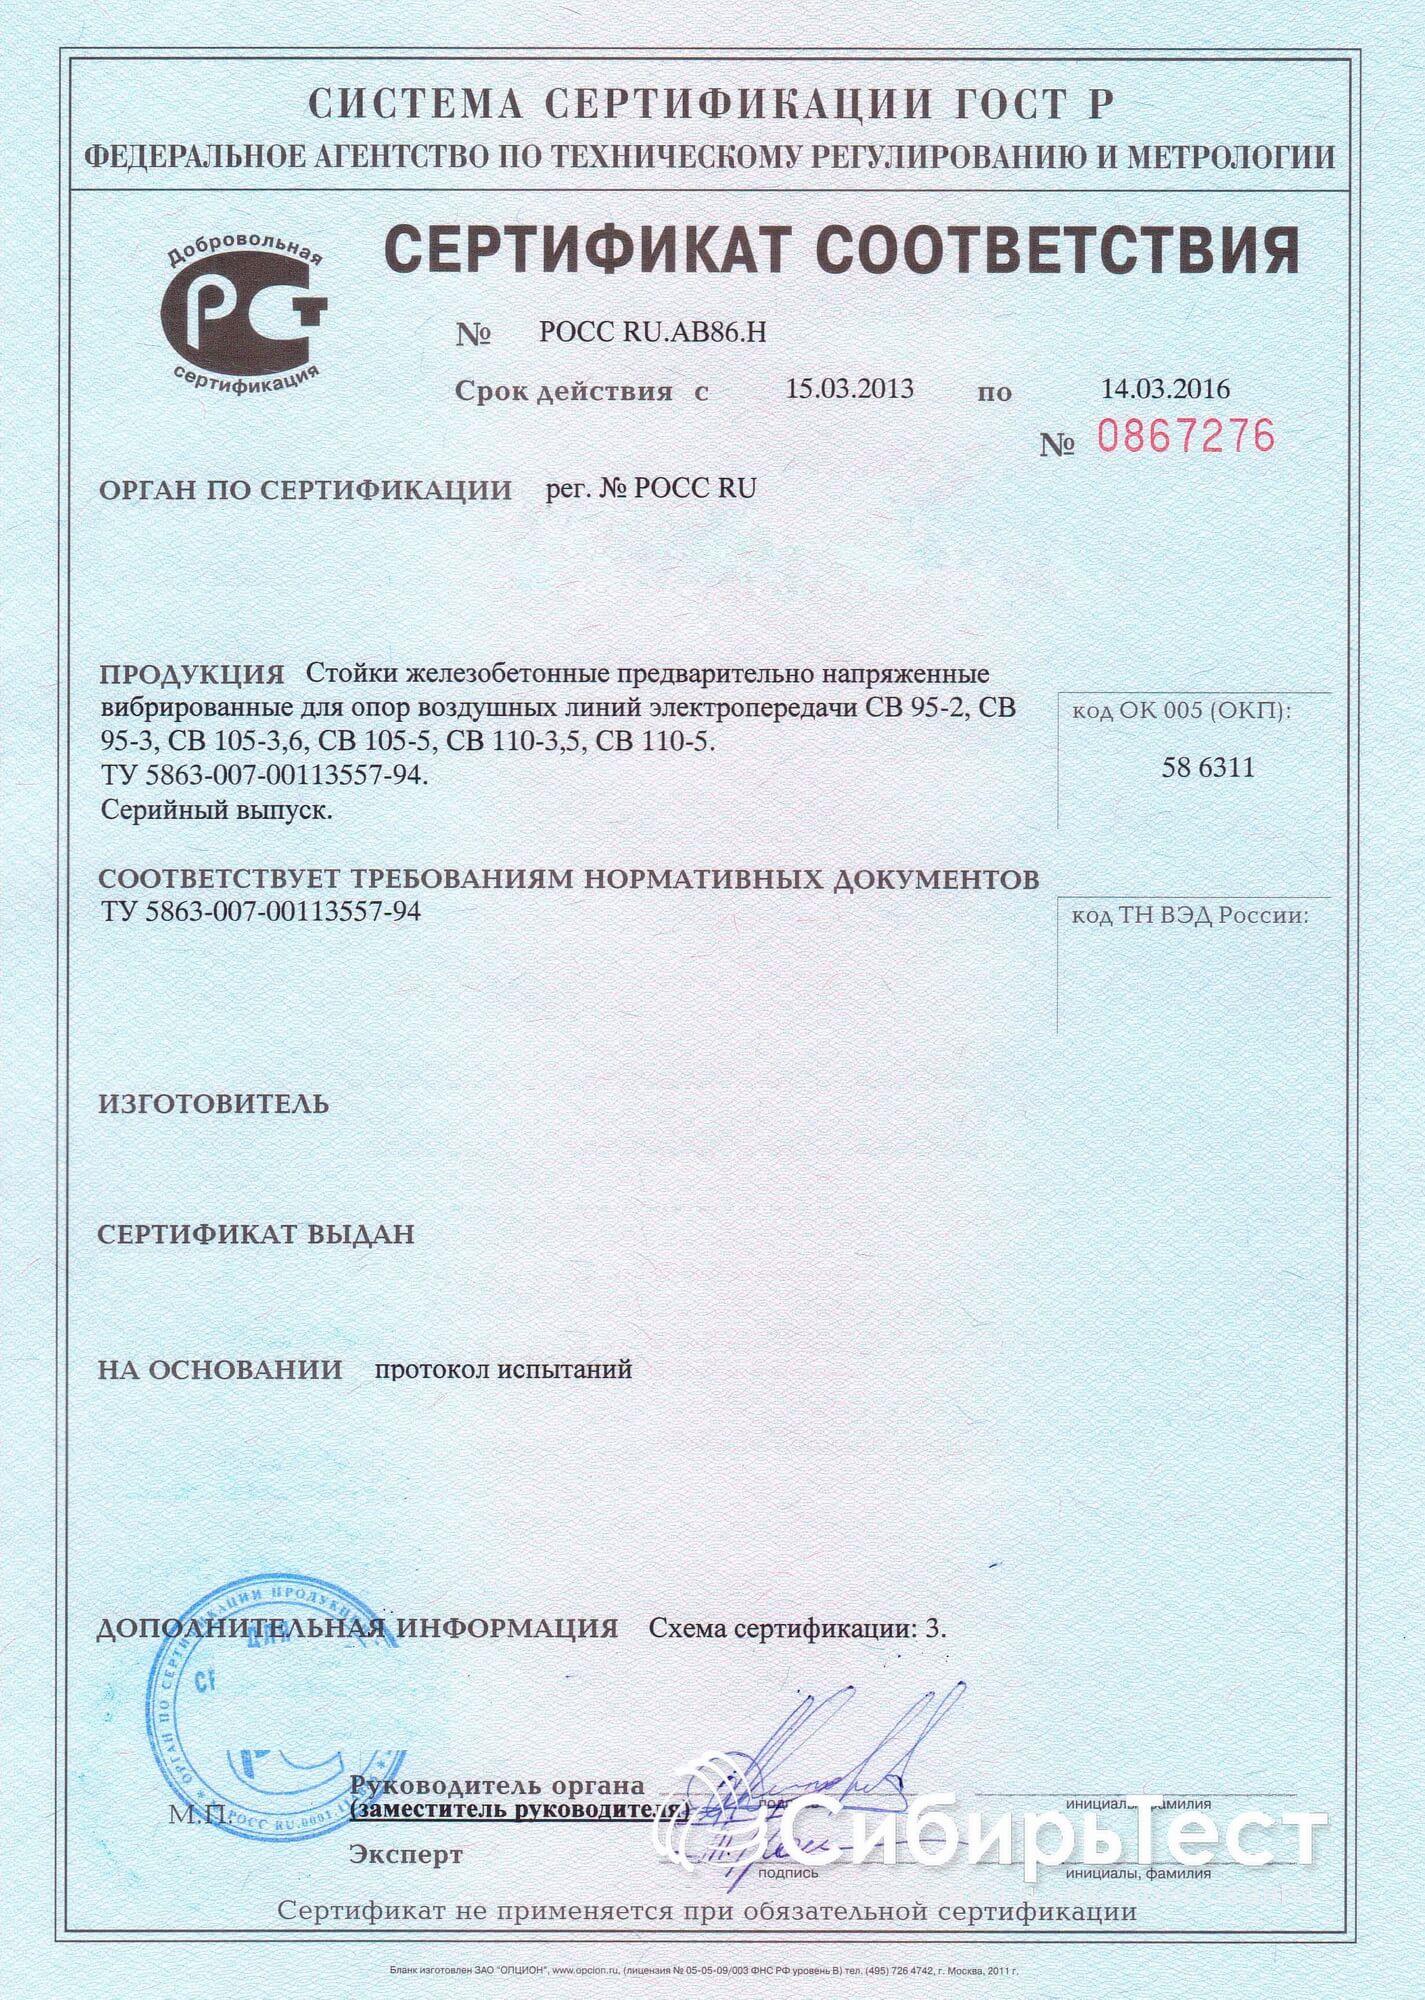 Сертификация ростехнадзора барнаул руководство по качеству сертификация охрана труда